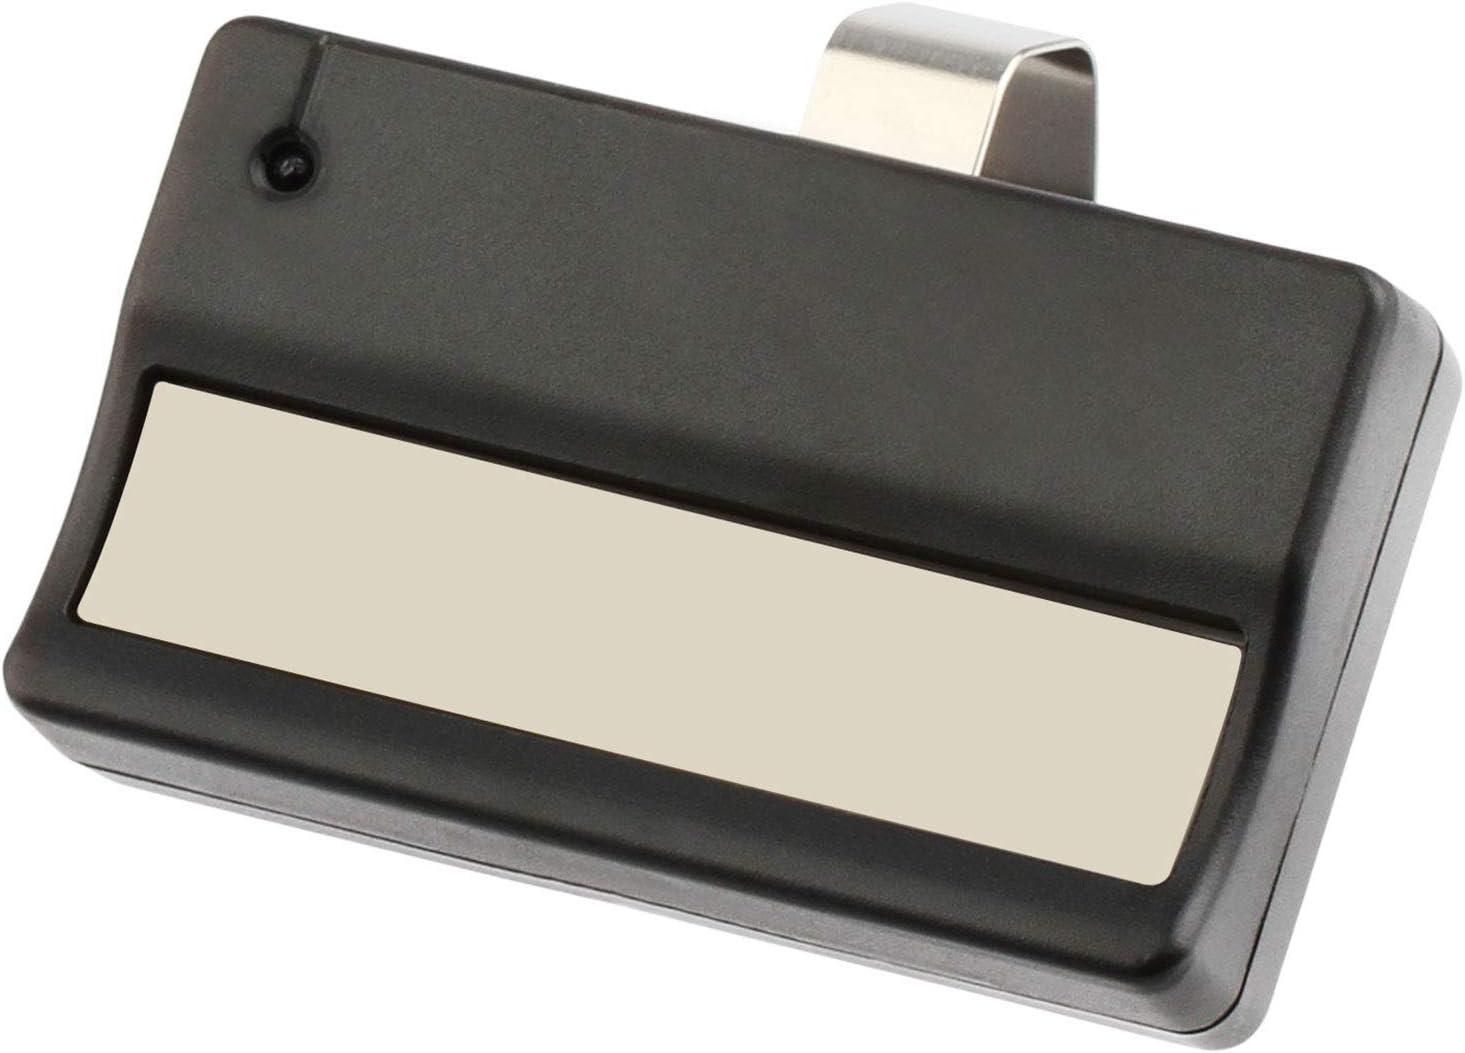 for Liftmaster 61LM Garage Door Remote Opener (1984-1993) 8 or 9 Dip Switchs - 300-400Mhz